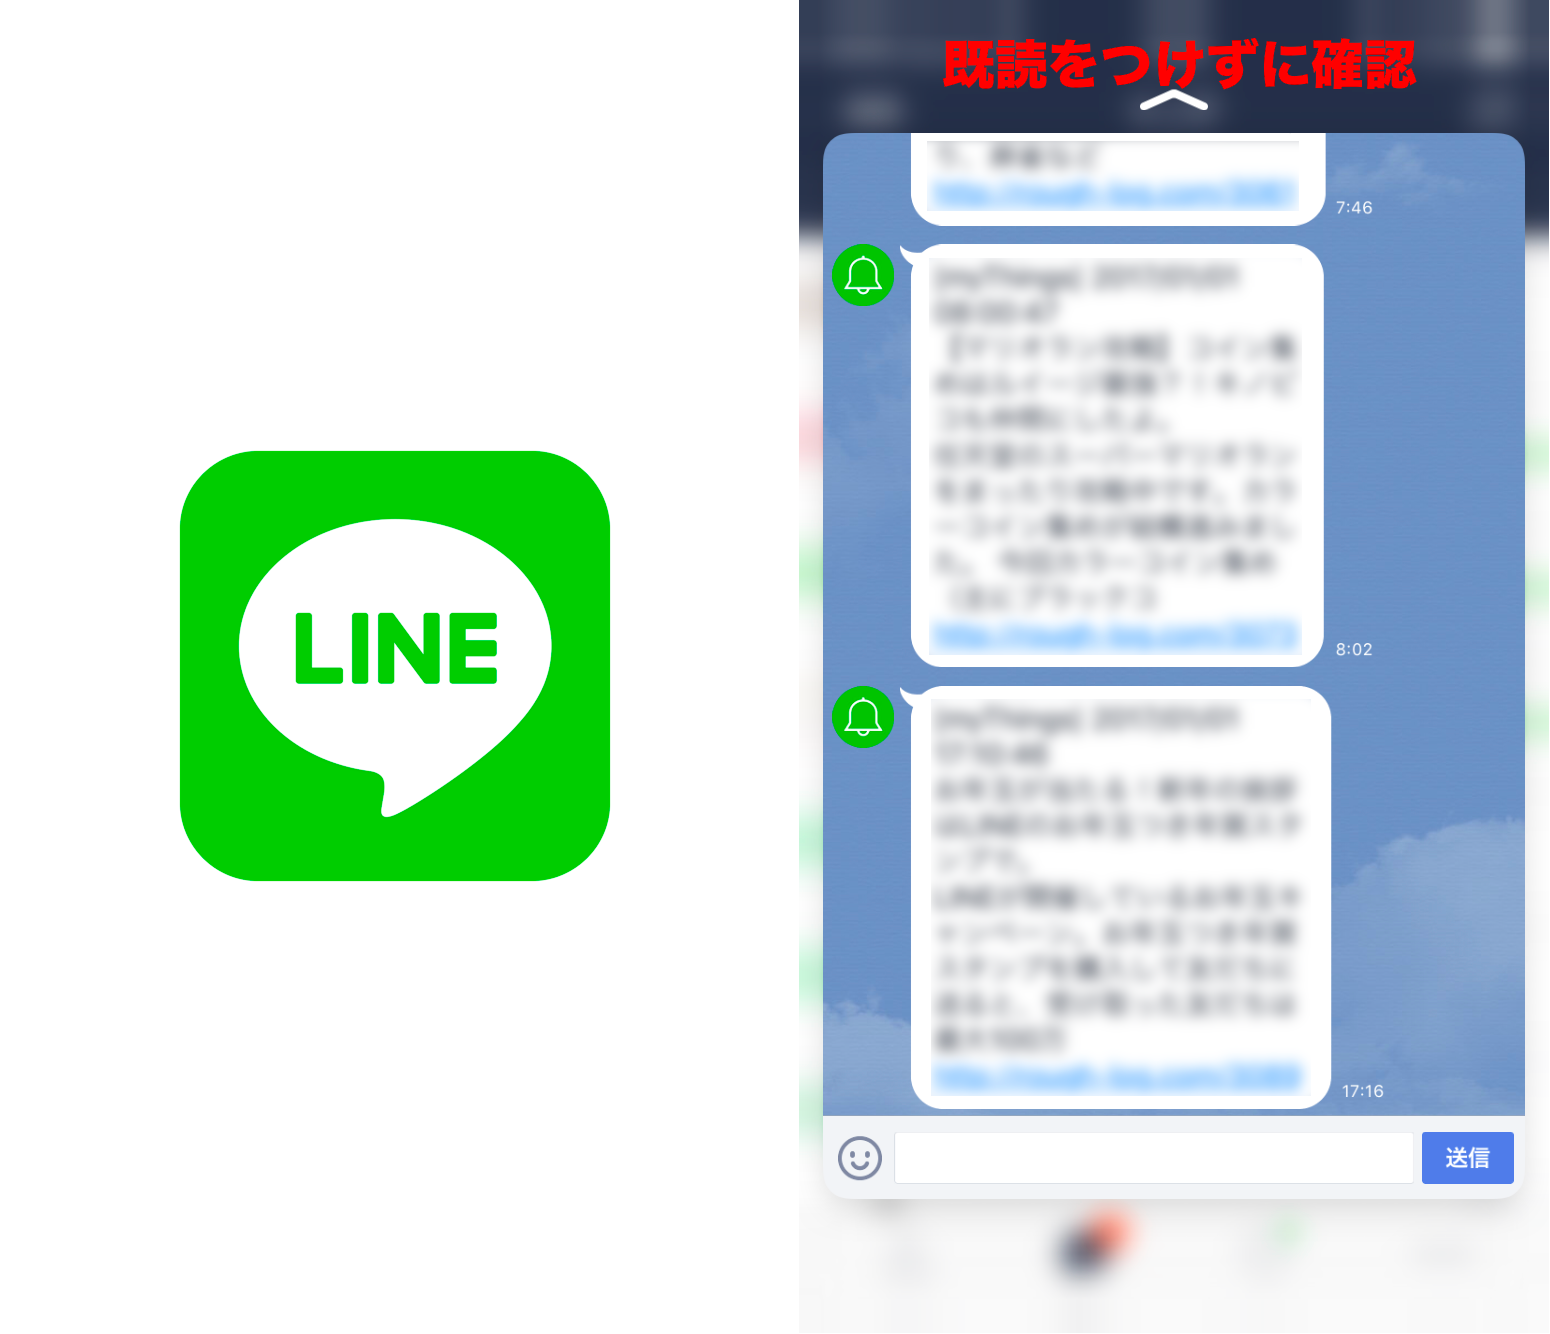 line0102-4